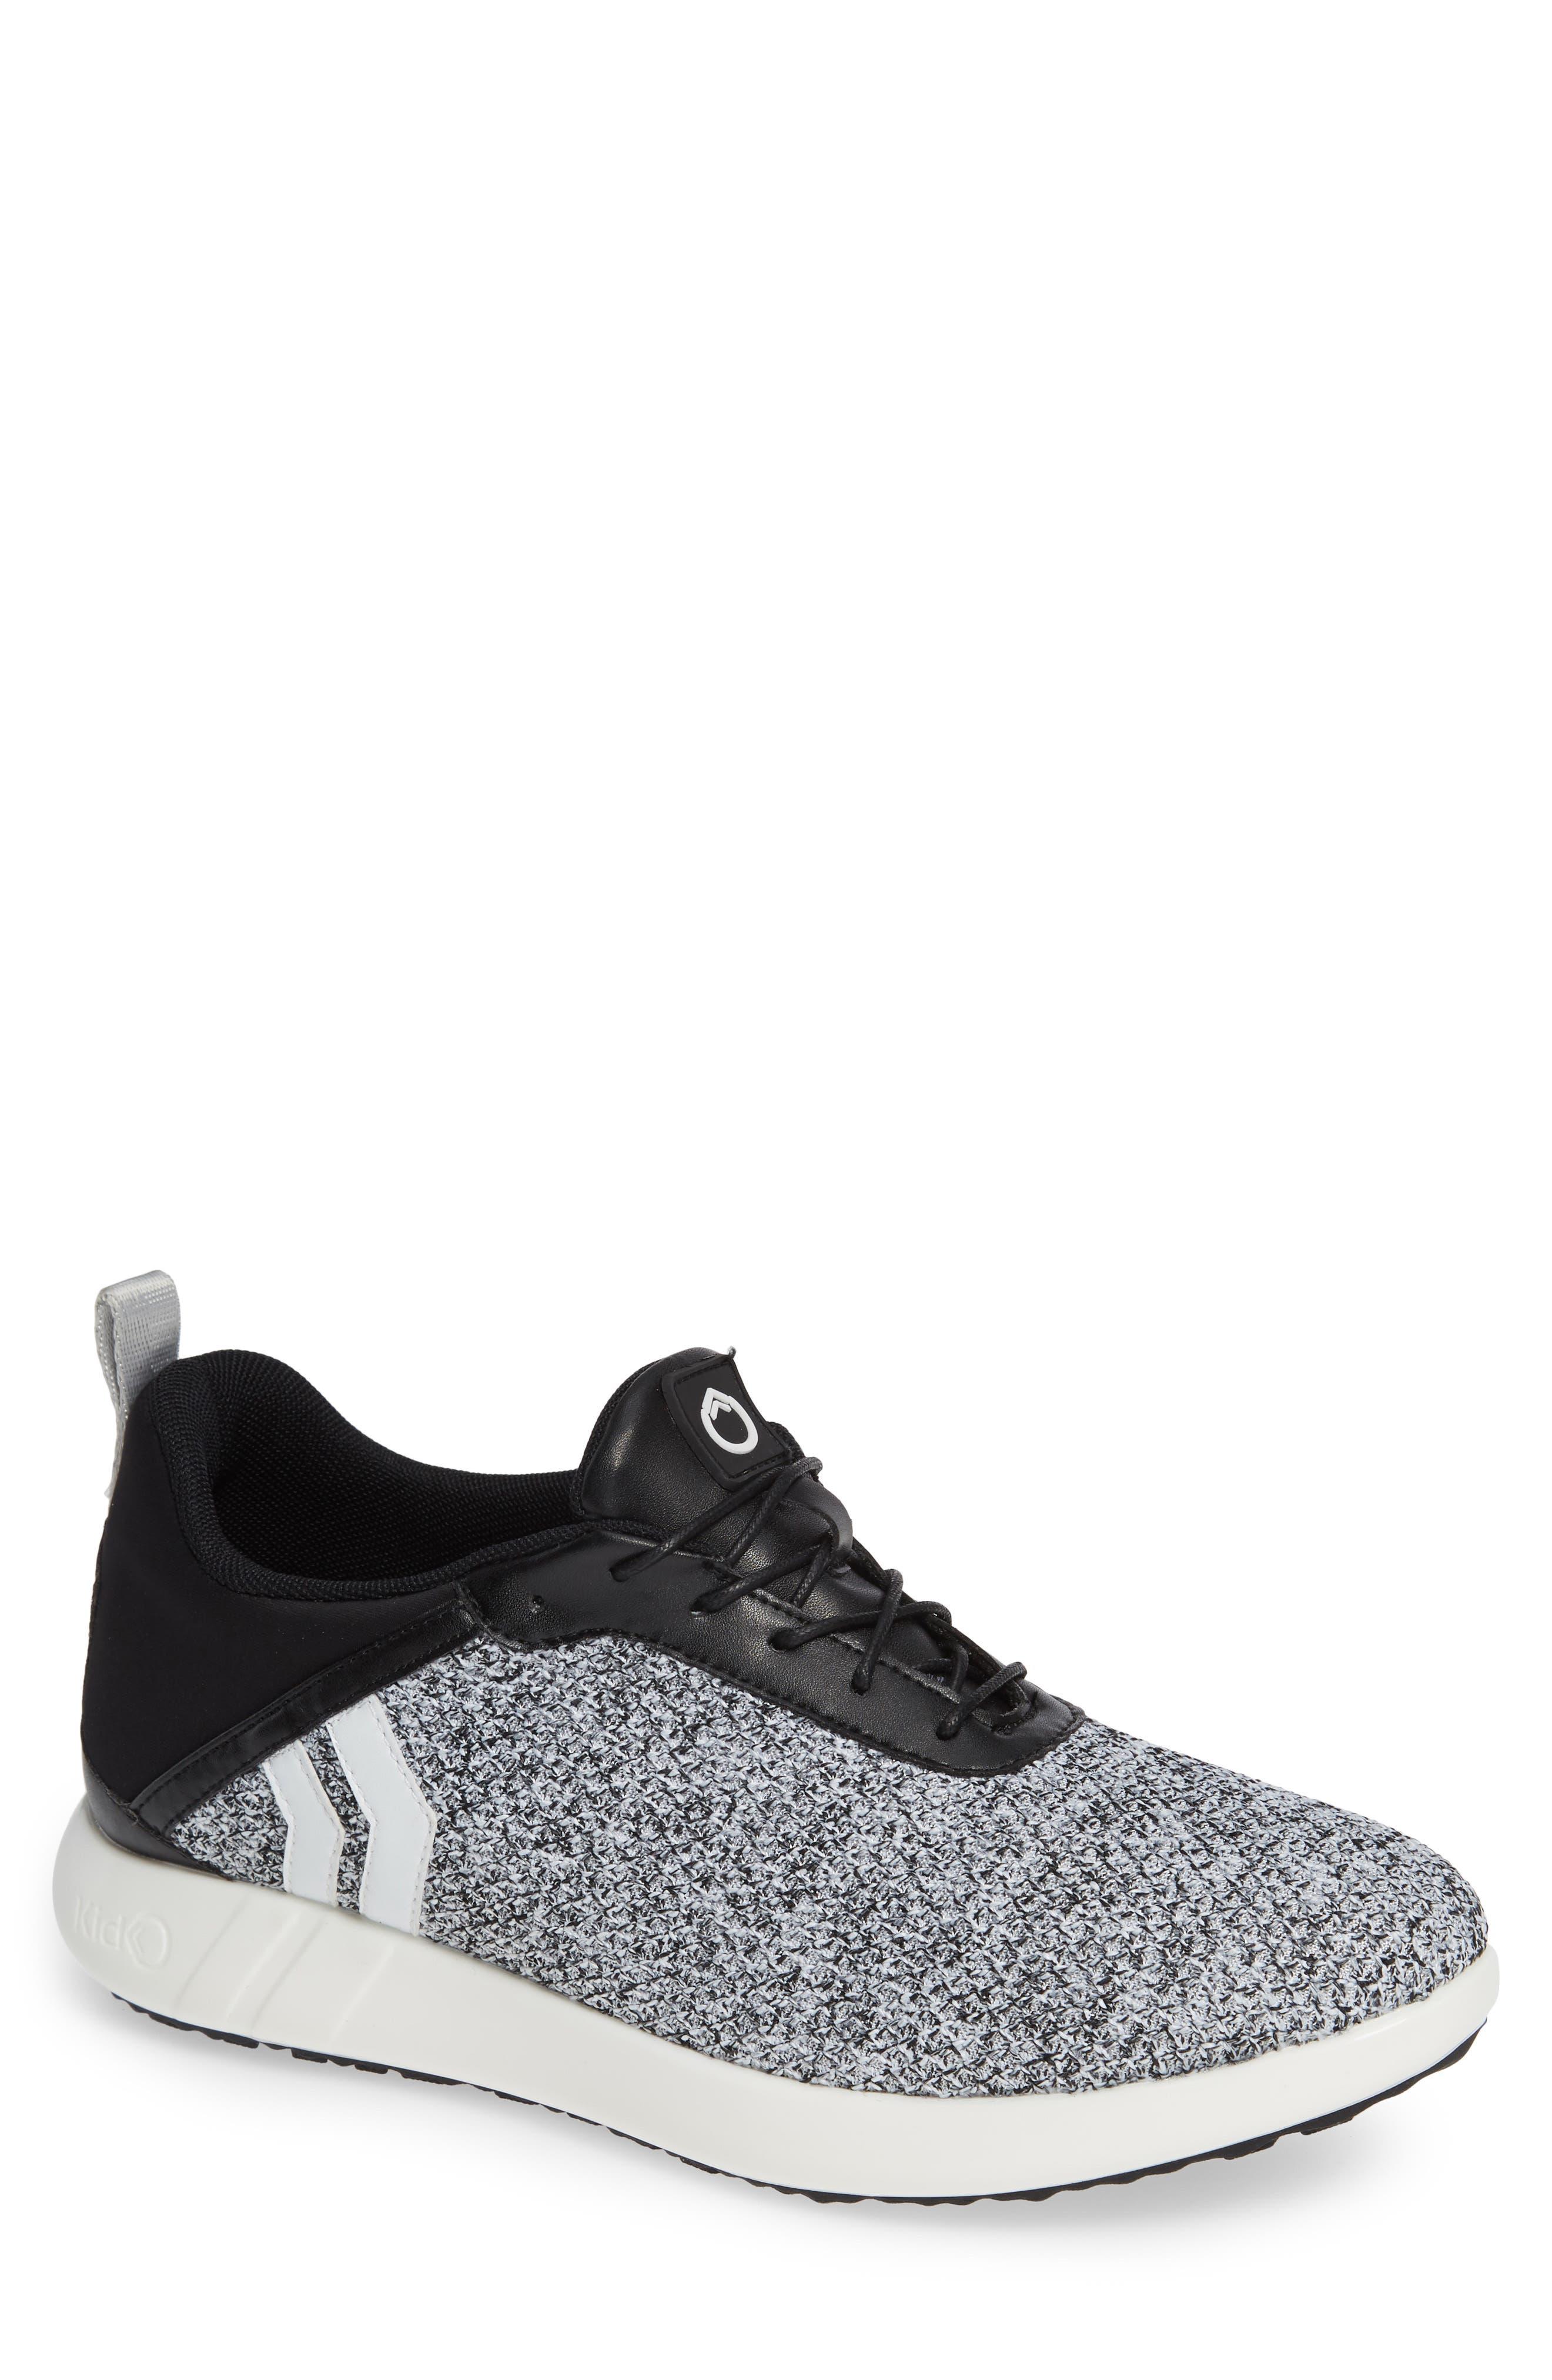 KICKO Encore Sneaker, Main, color, 111